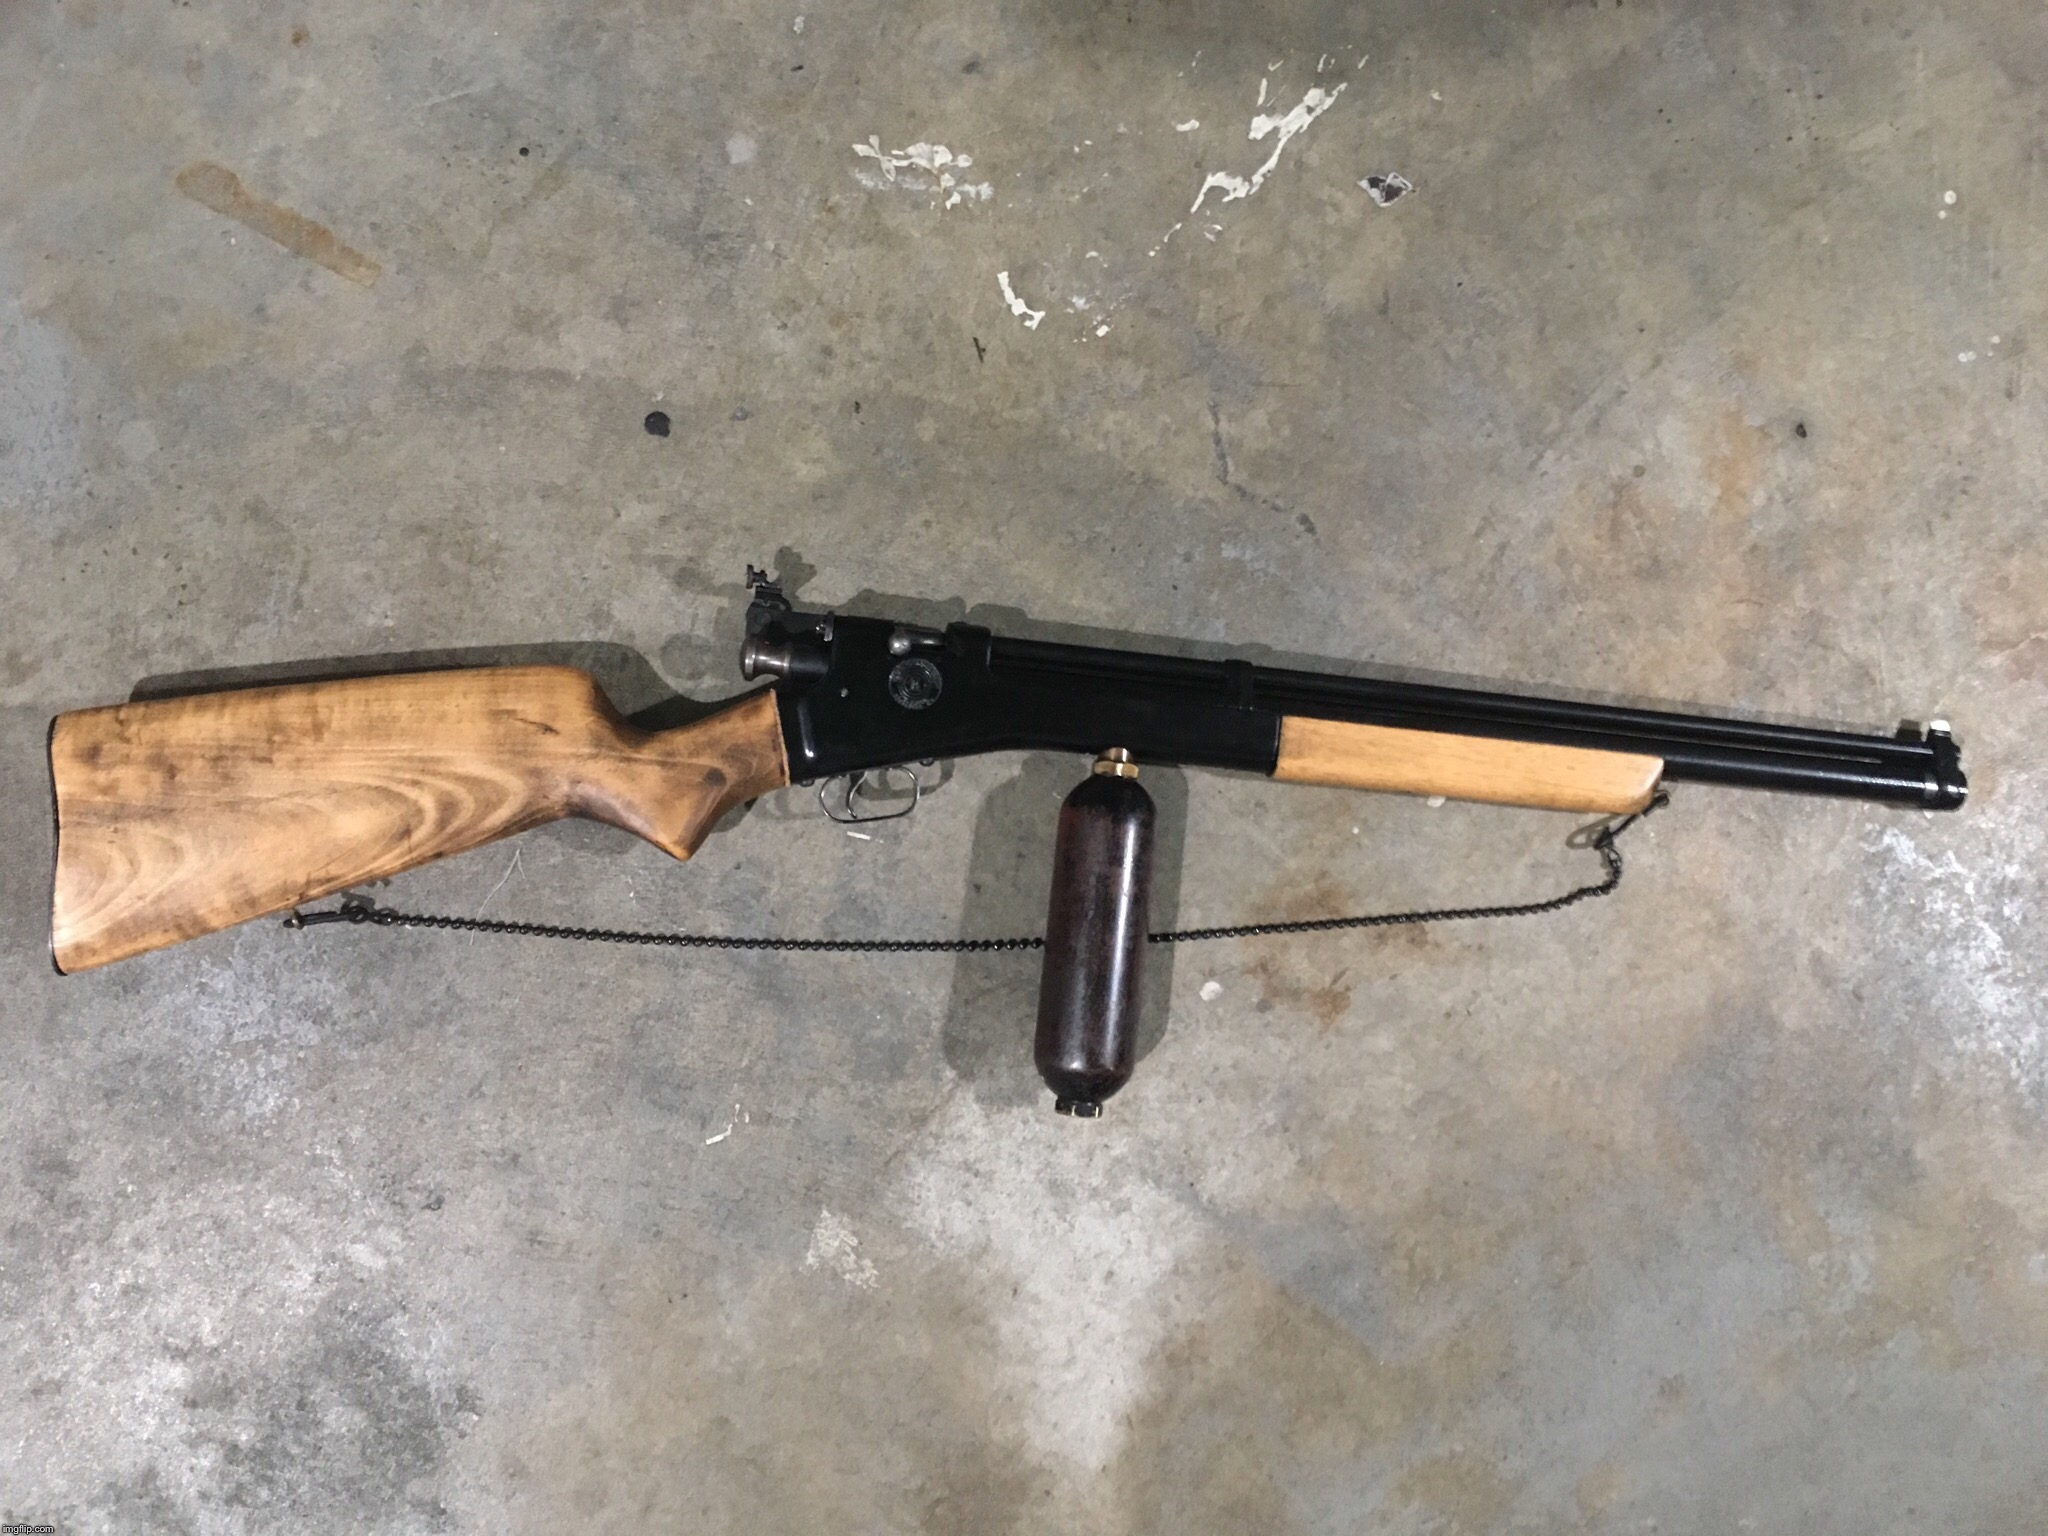 Lets see those oldies - Airguns & Guns Forum